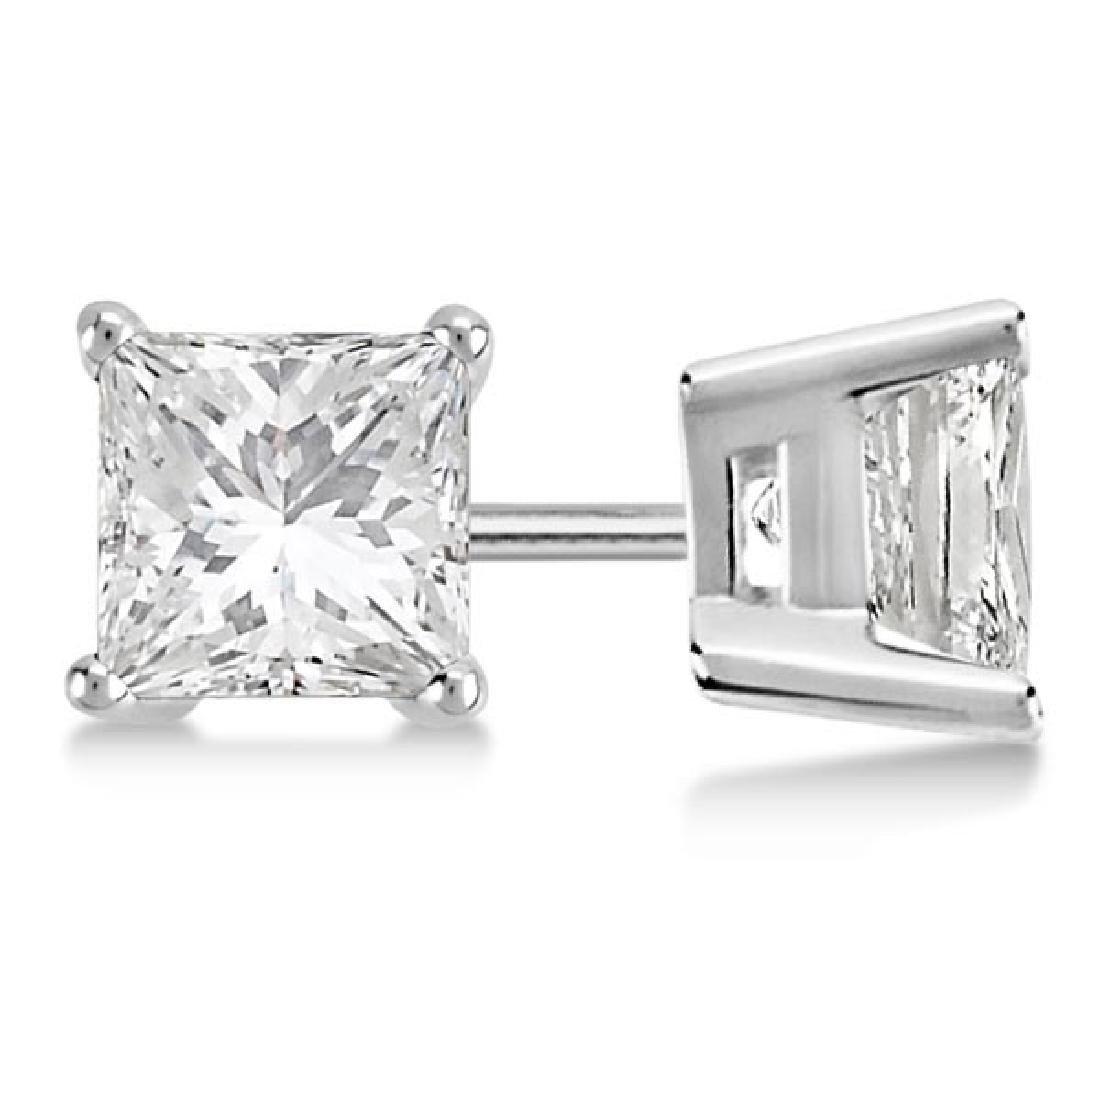 Certified 1.05 CTW Princess Diamond Stud Earrings E/SI1